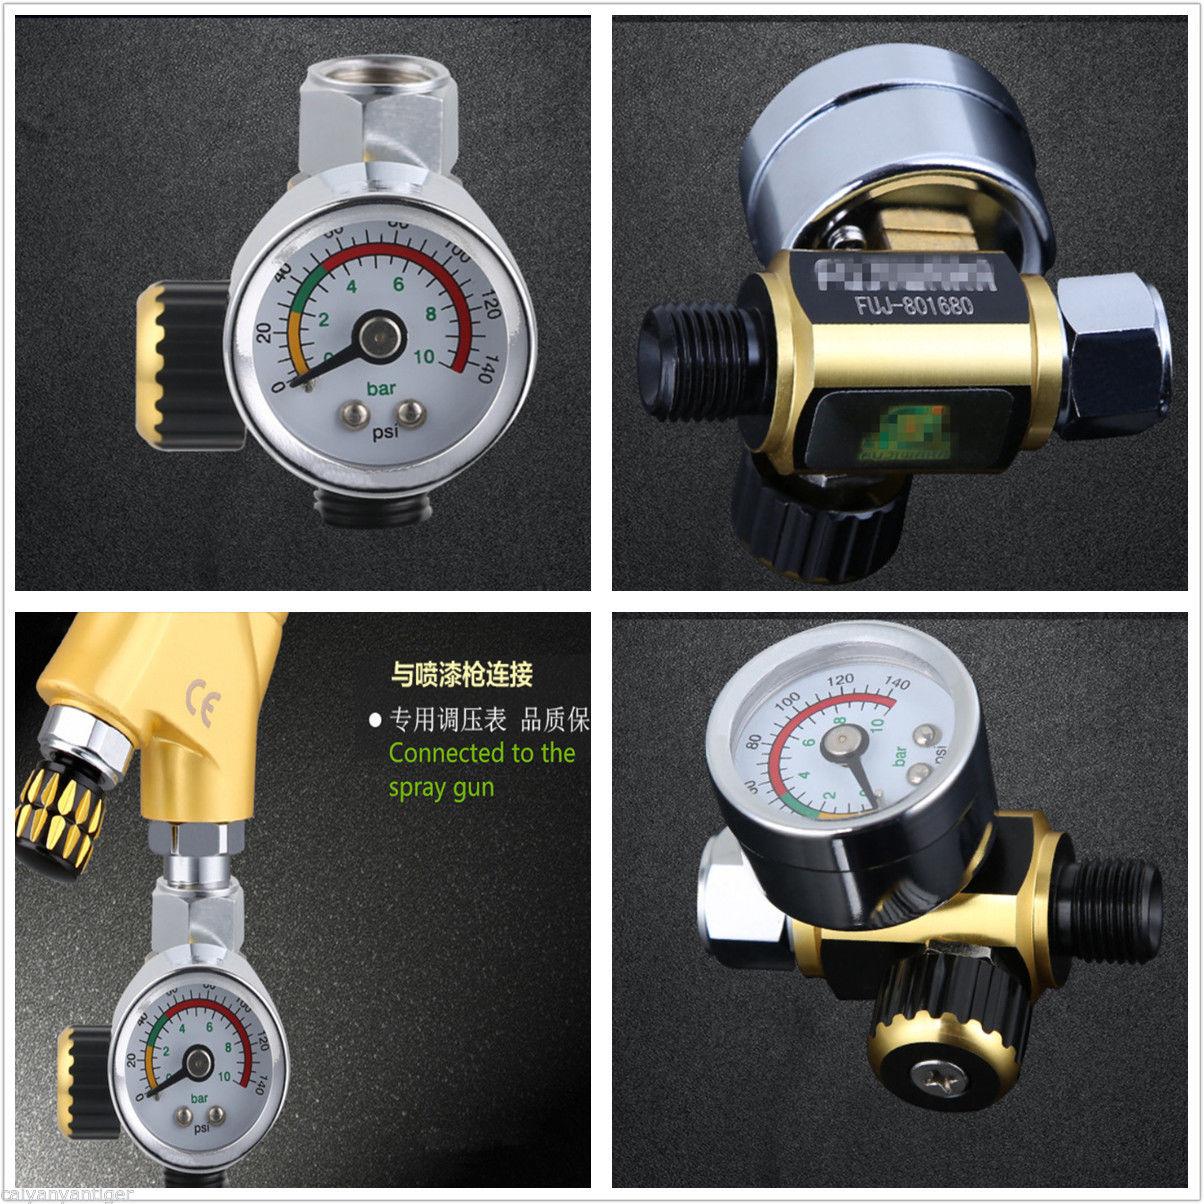 Universal Metal Spray Gun Air Pressure Regulator Gauge 0-0.10Mpa G1/4 Adjustable Relief Regulating Regulator Pressure Regulator